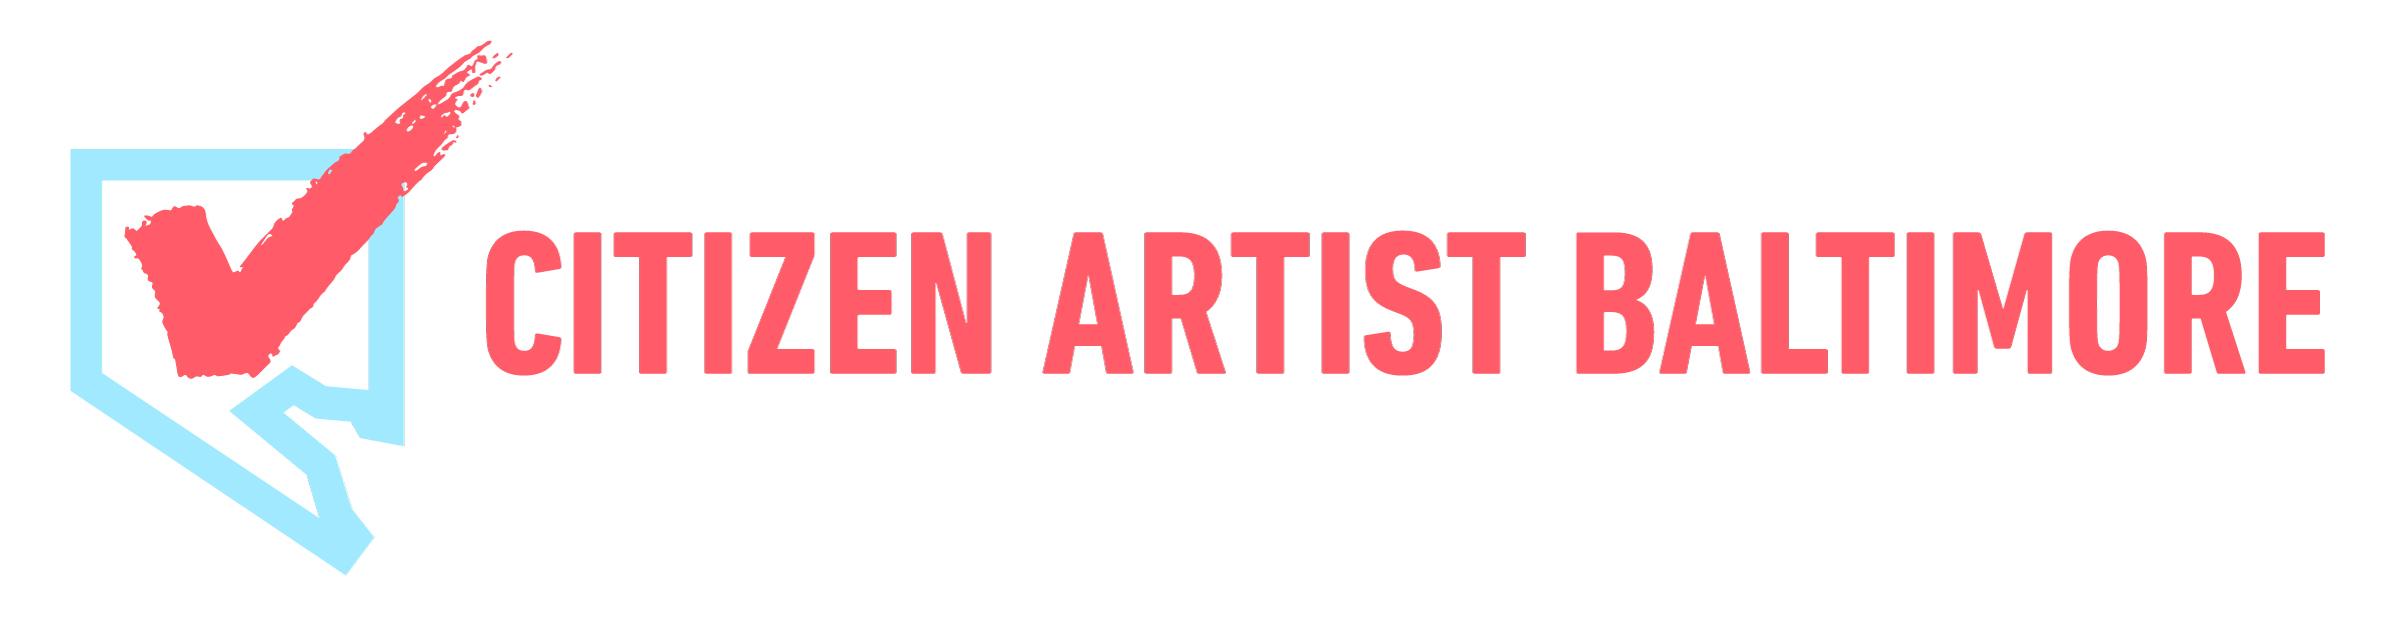 CitizenArtist-logo-horizontal